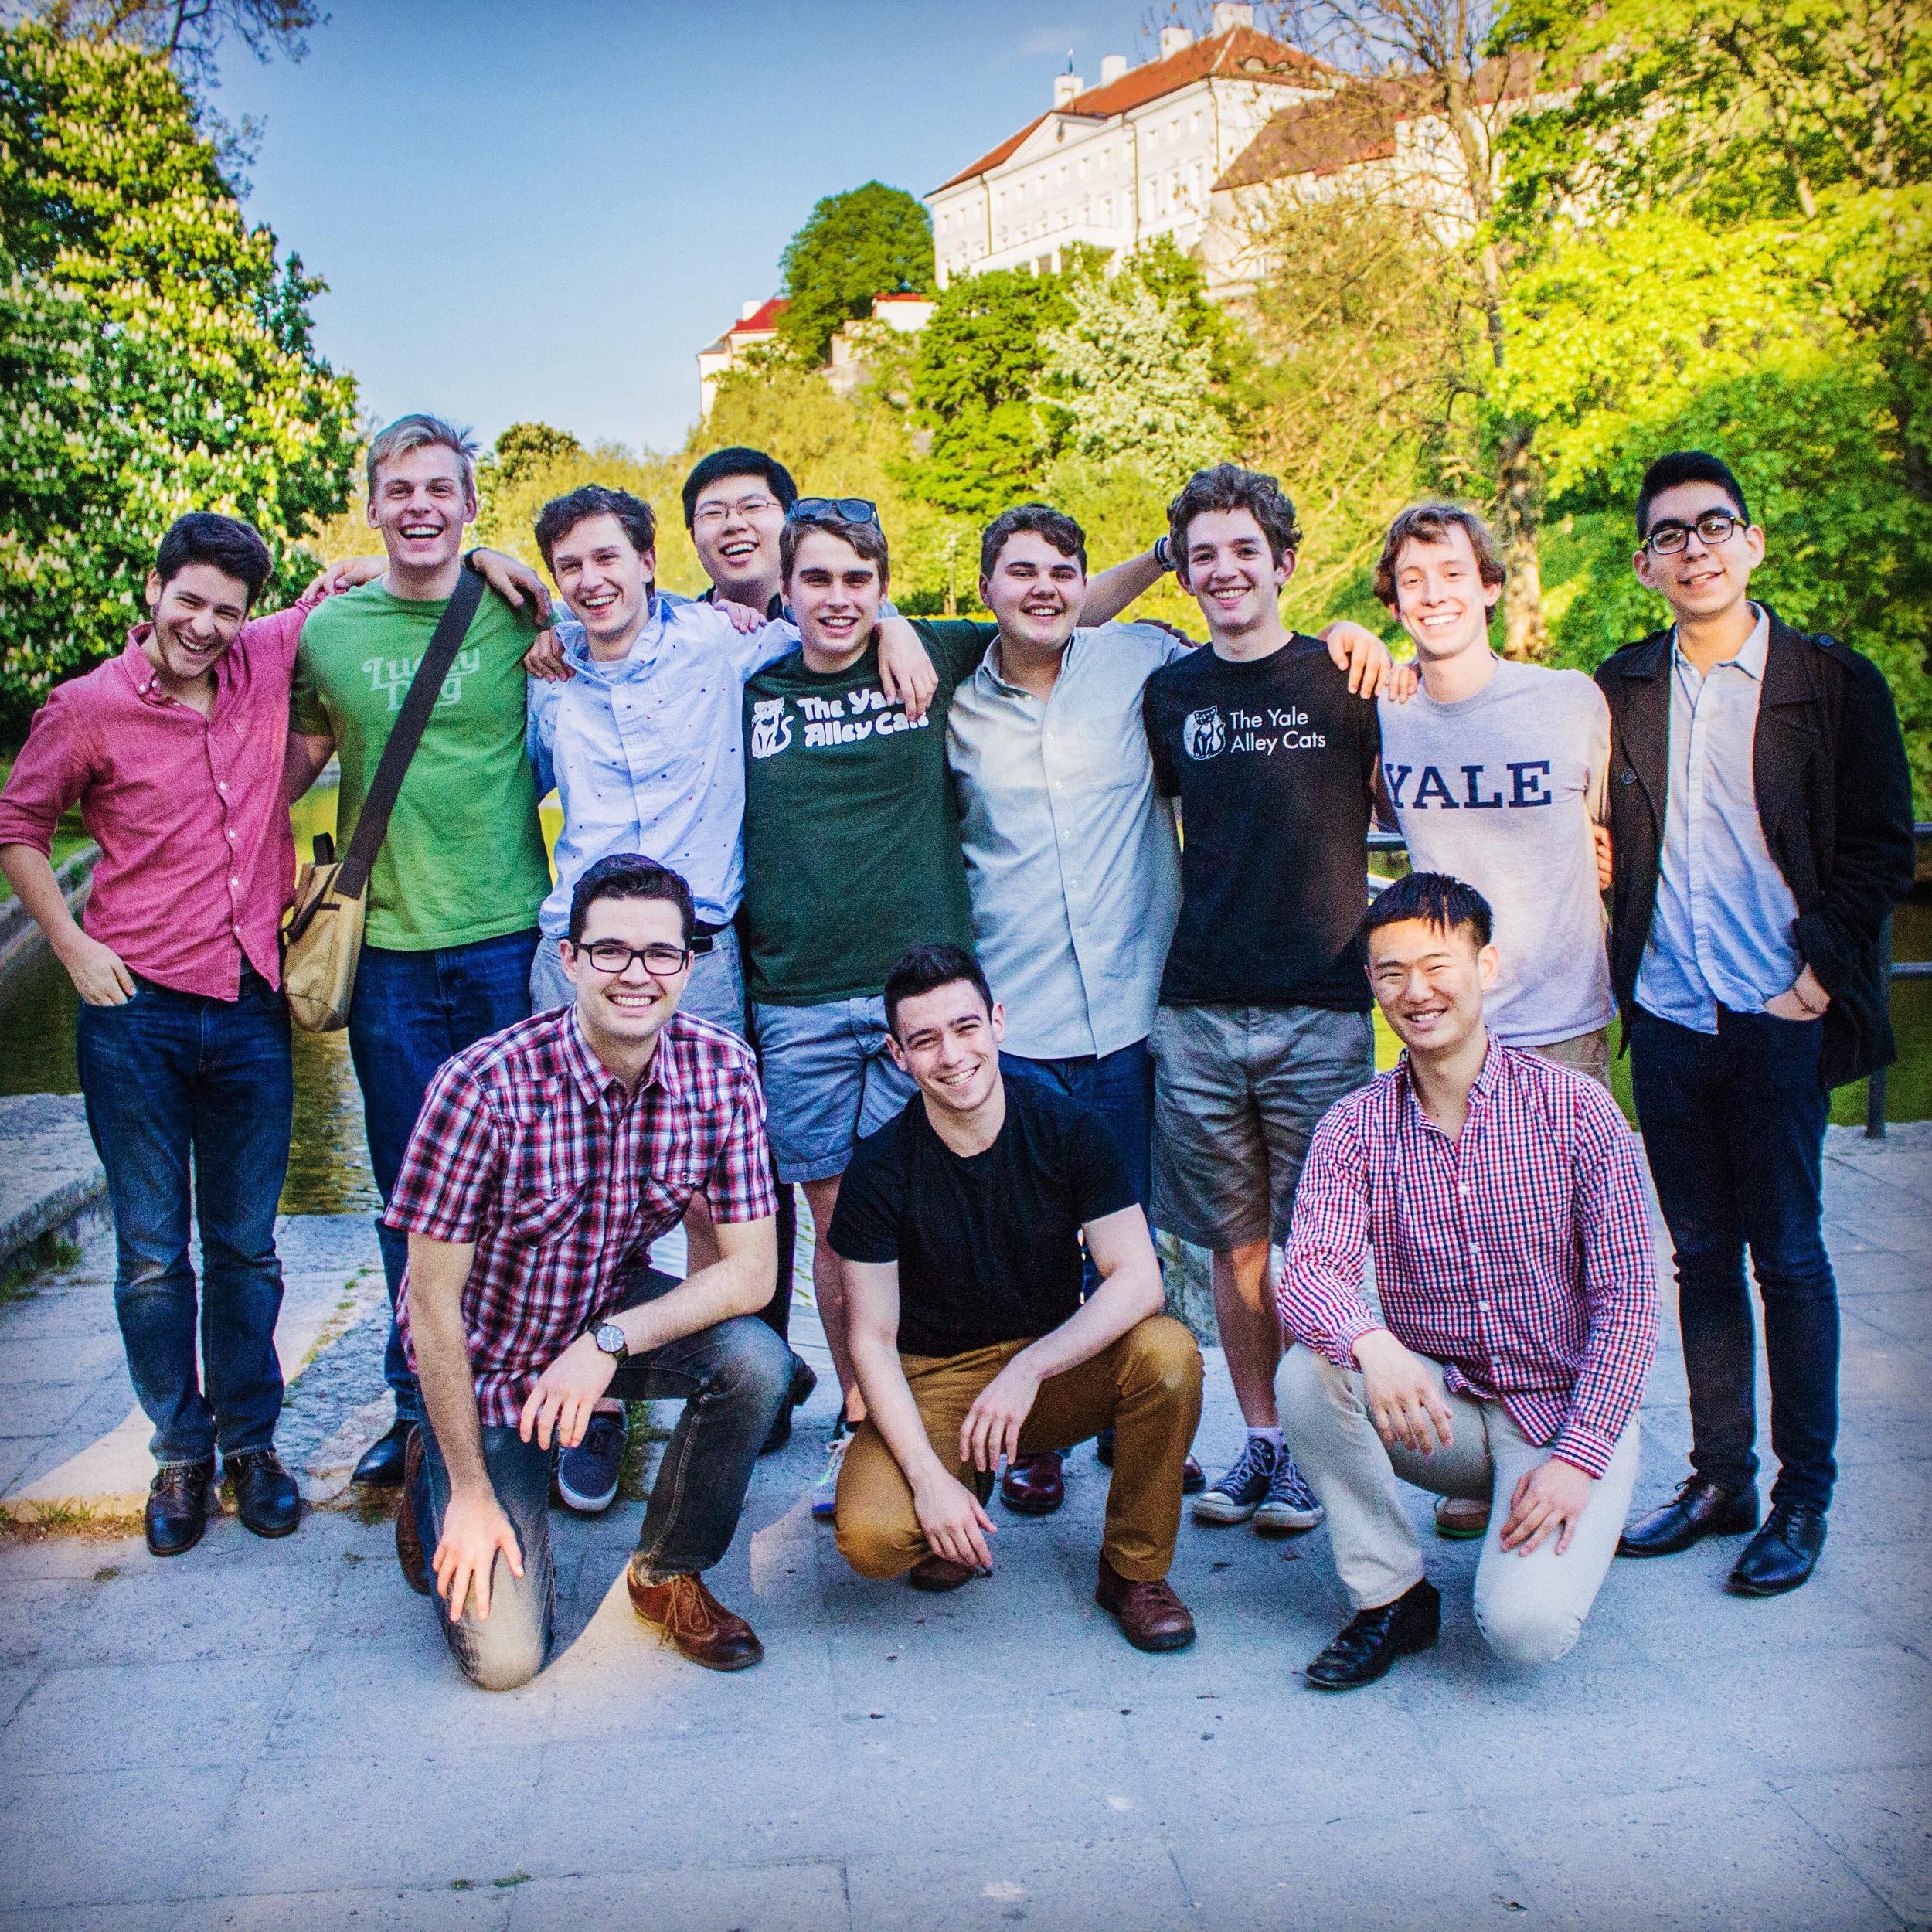 Enjoying the last day of summer tour together in Tallinn, Estonia